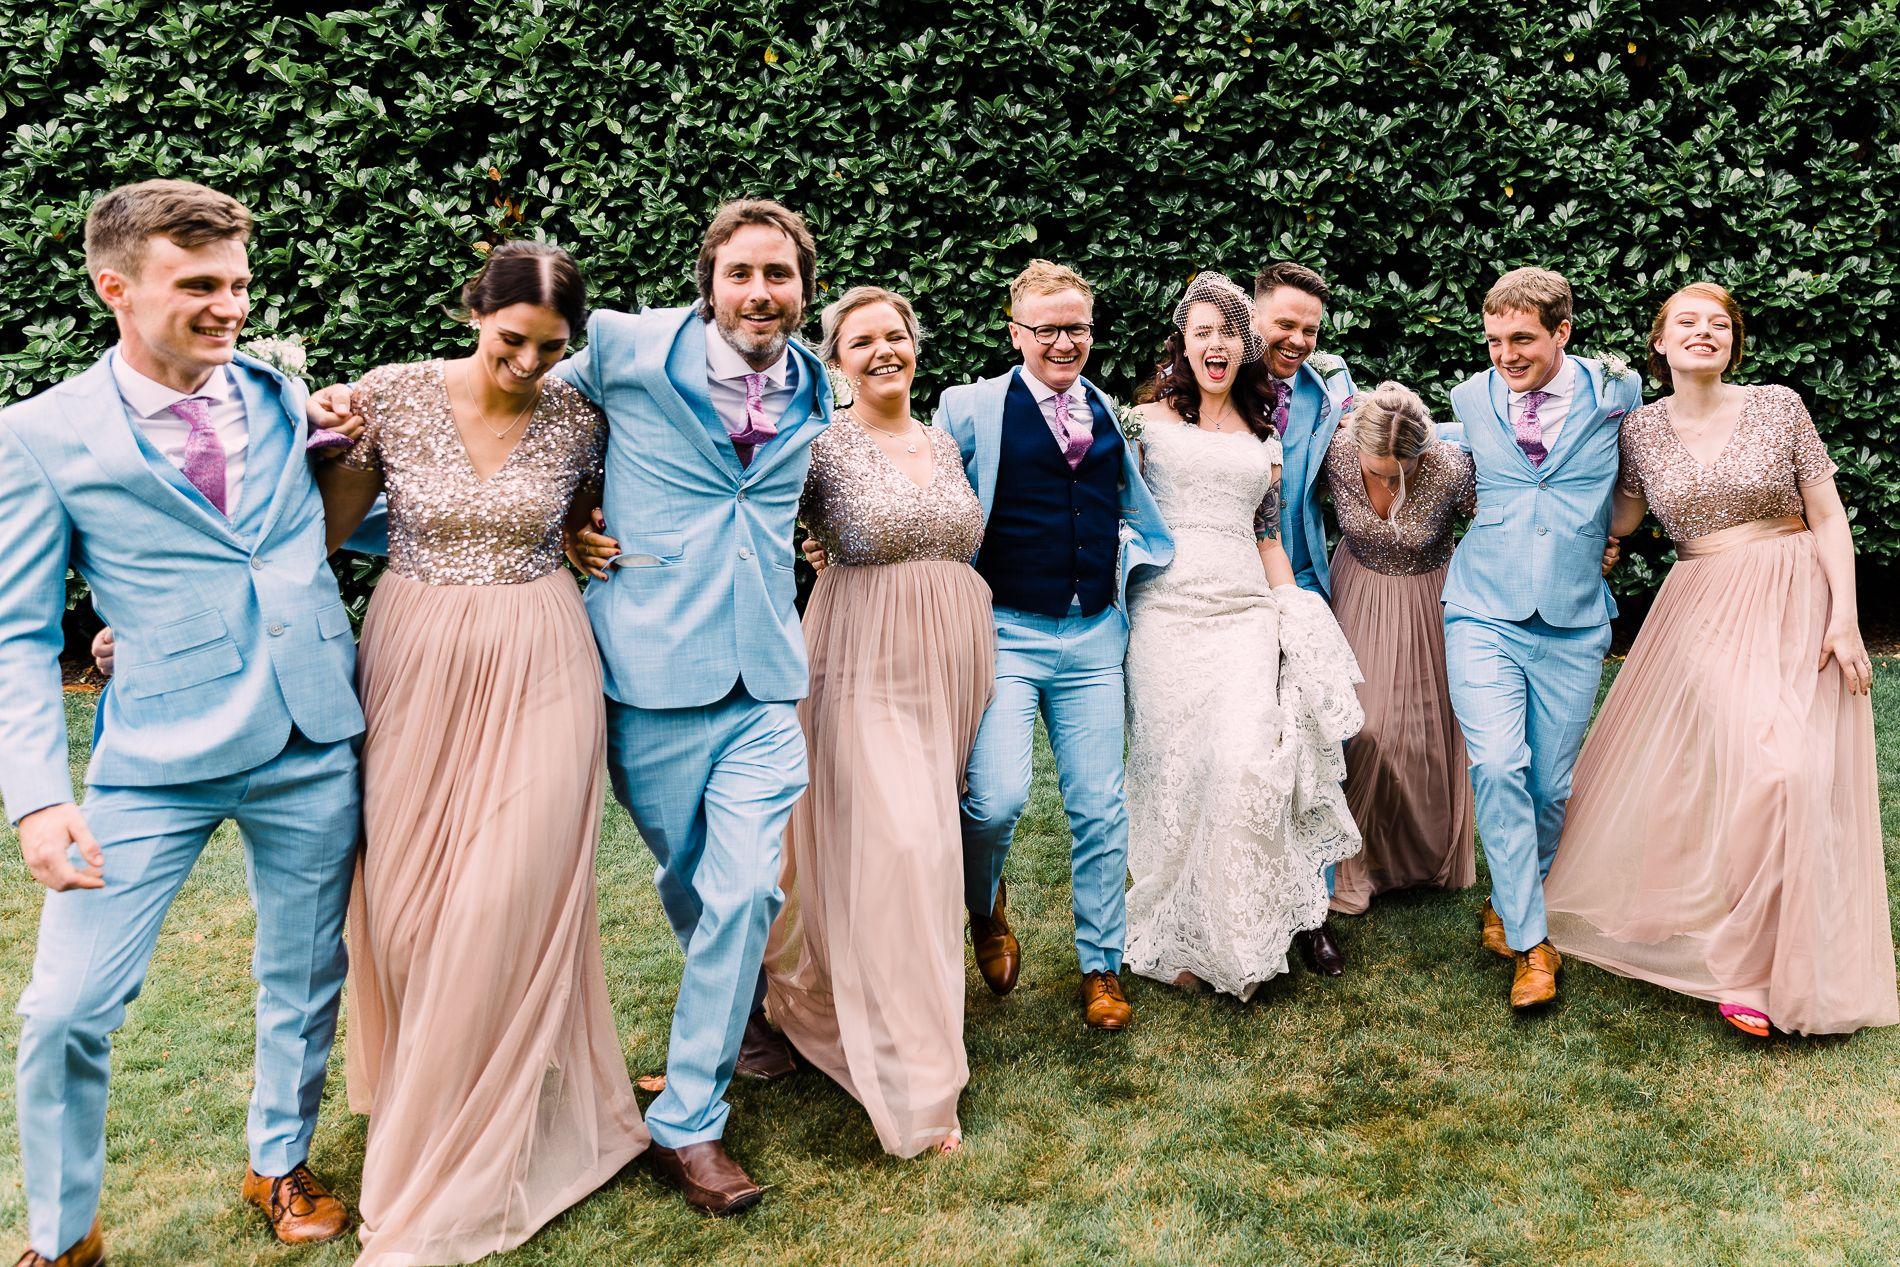 Wedding_Photography_Becky_Tranter-5